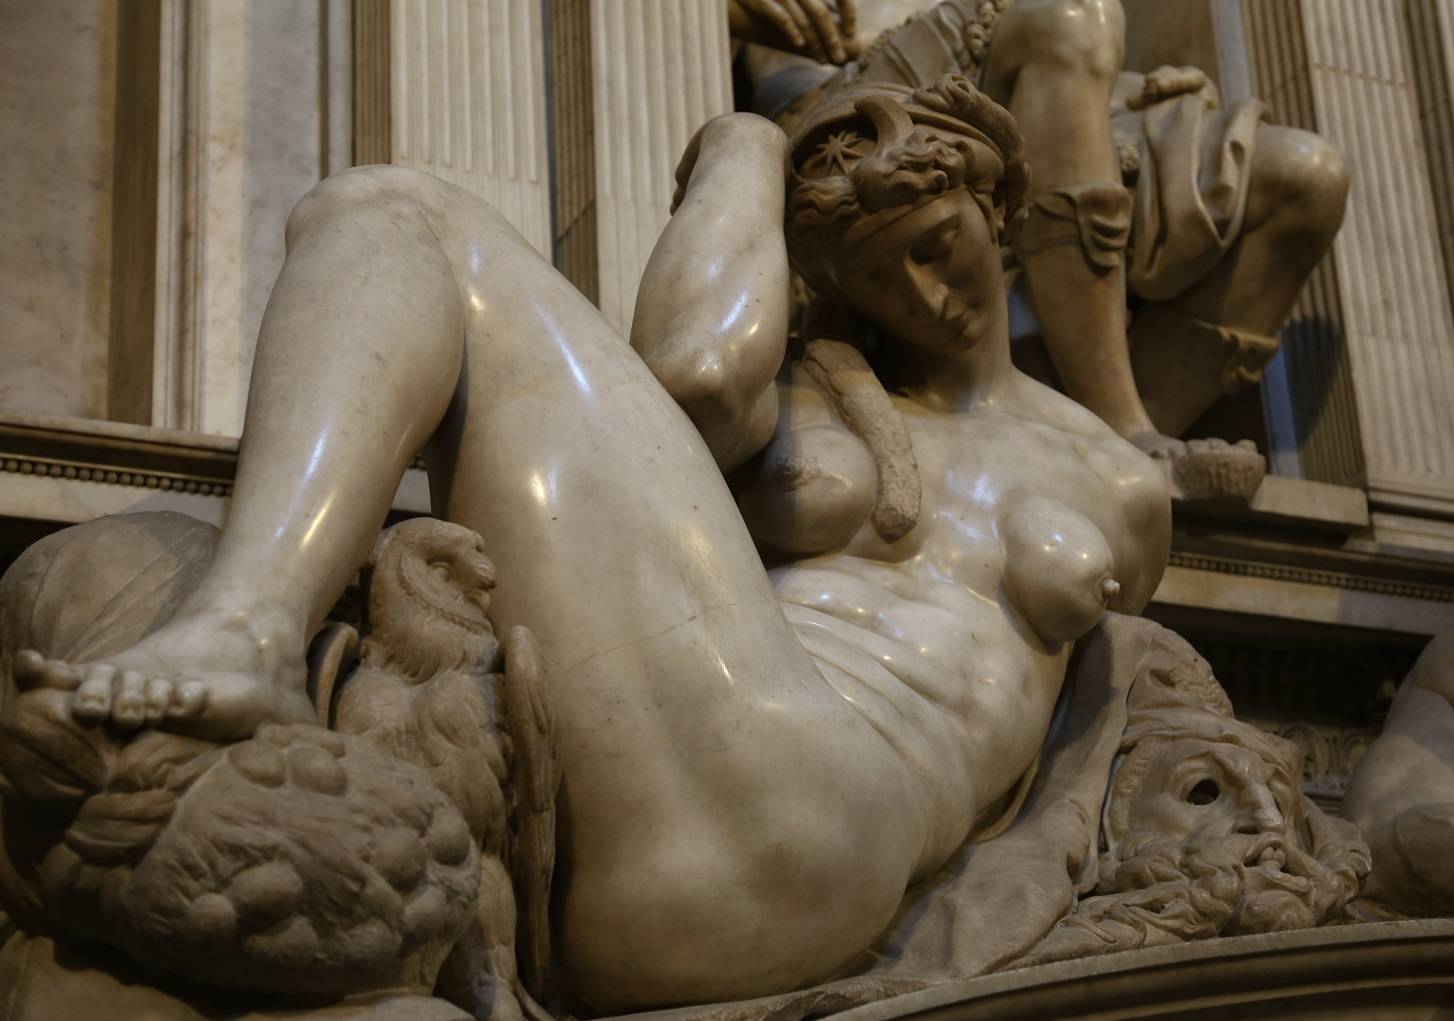 Grabmal_von_Giuliano_II._de_Medici_(Michelangelo)_Cappelle_Medicee_Florenz-5.jpg